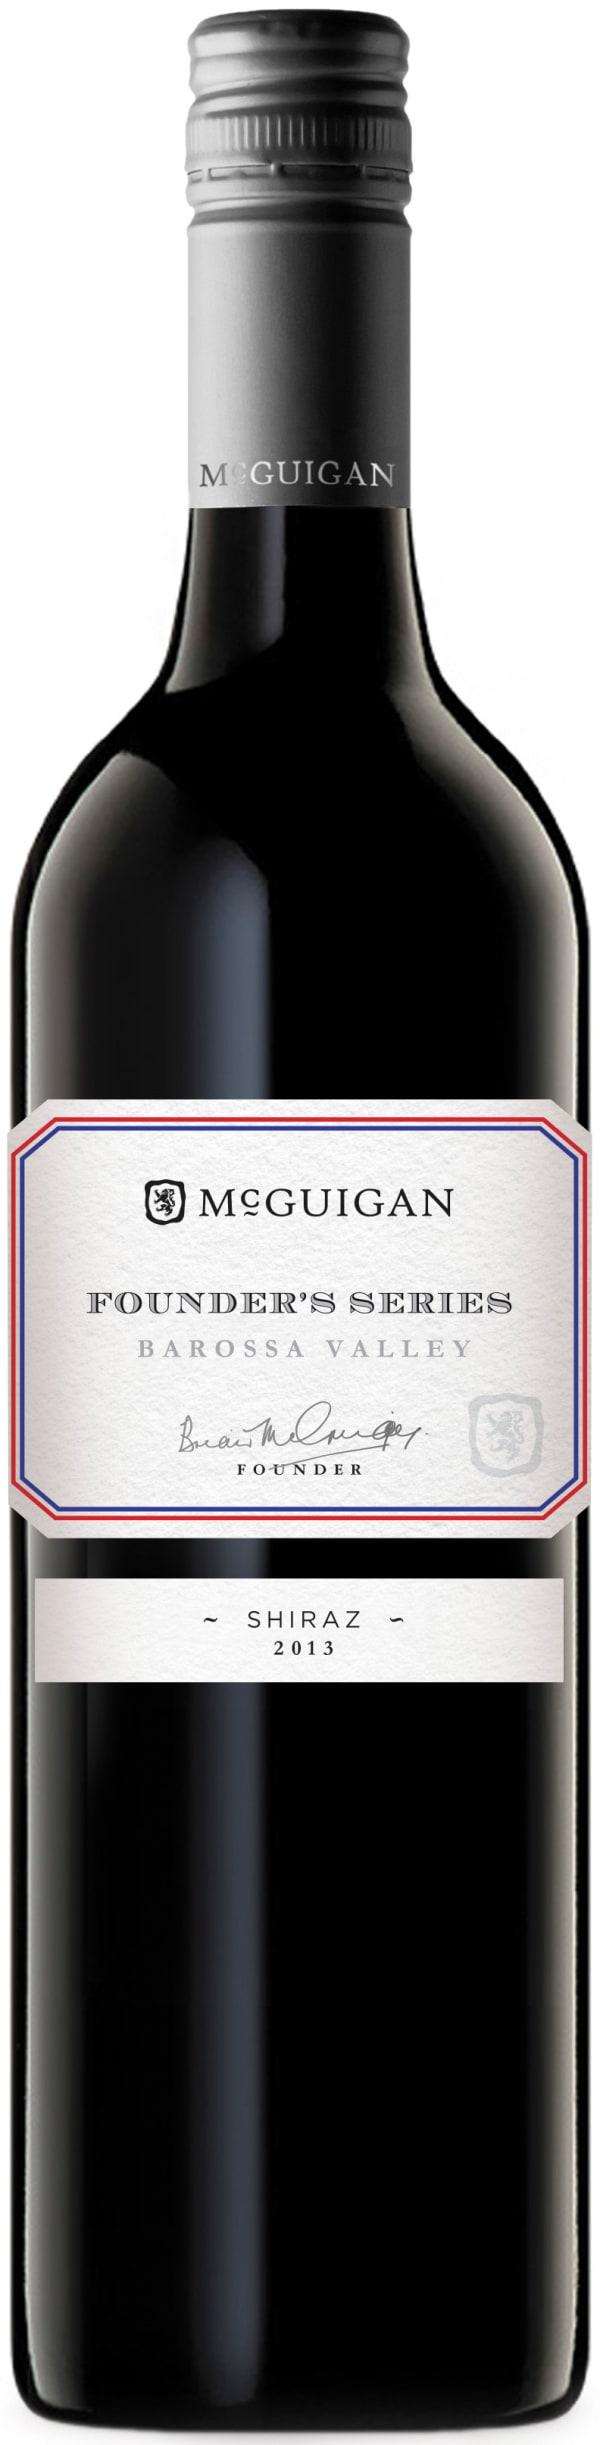 McGuigan Founder's Shiraz 2014